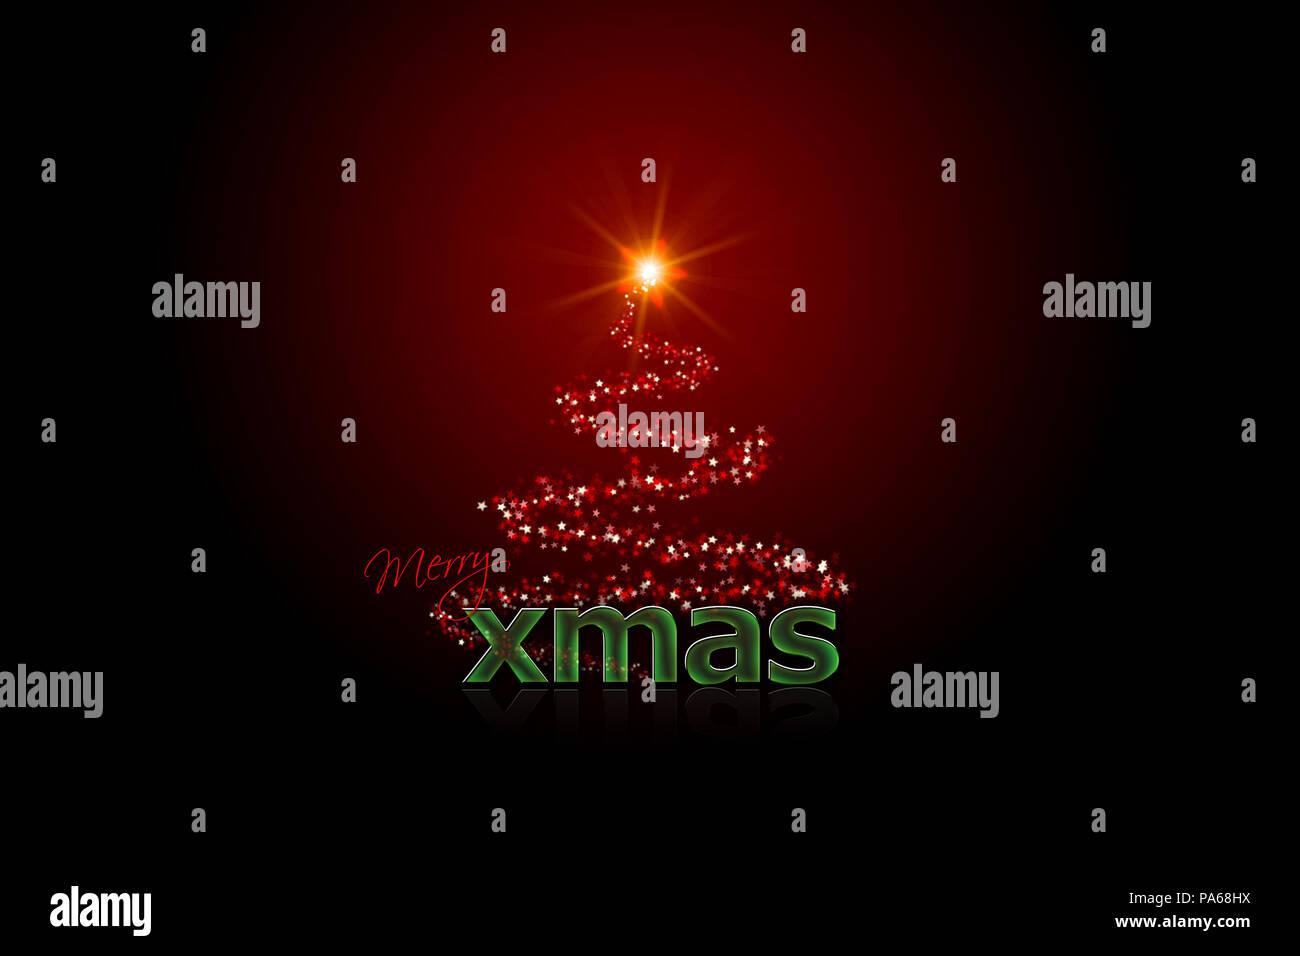 An illustration of a nice xmas theme Stock Photo: 212809462 - Alamy